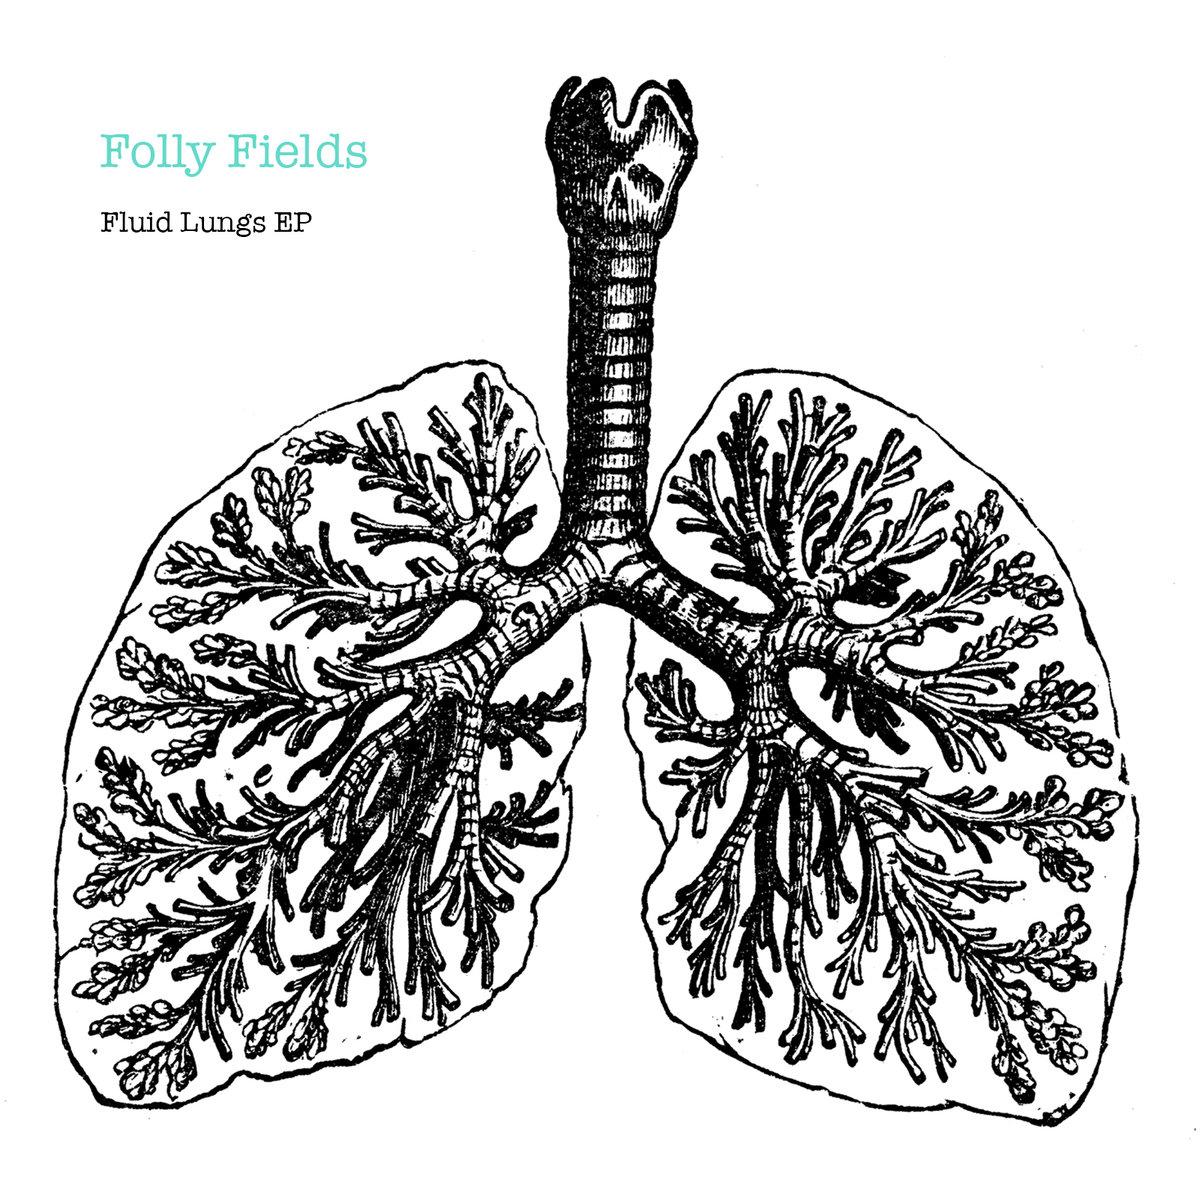 1200x1200 Fluid Lungs Ep Folly Fields